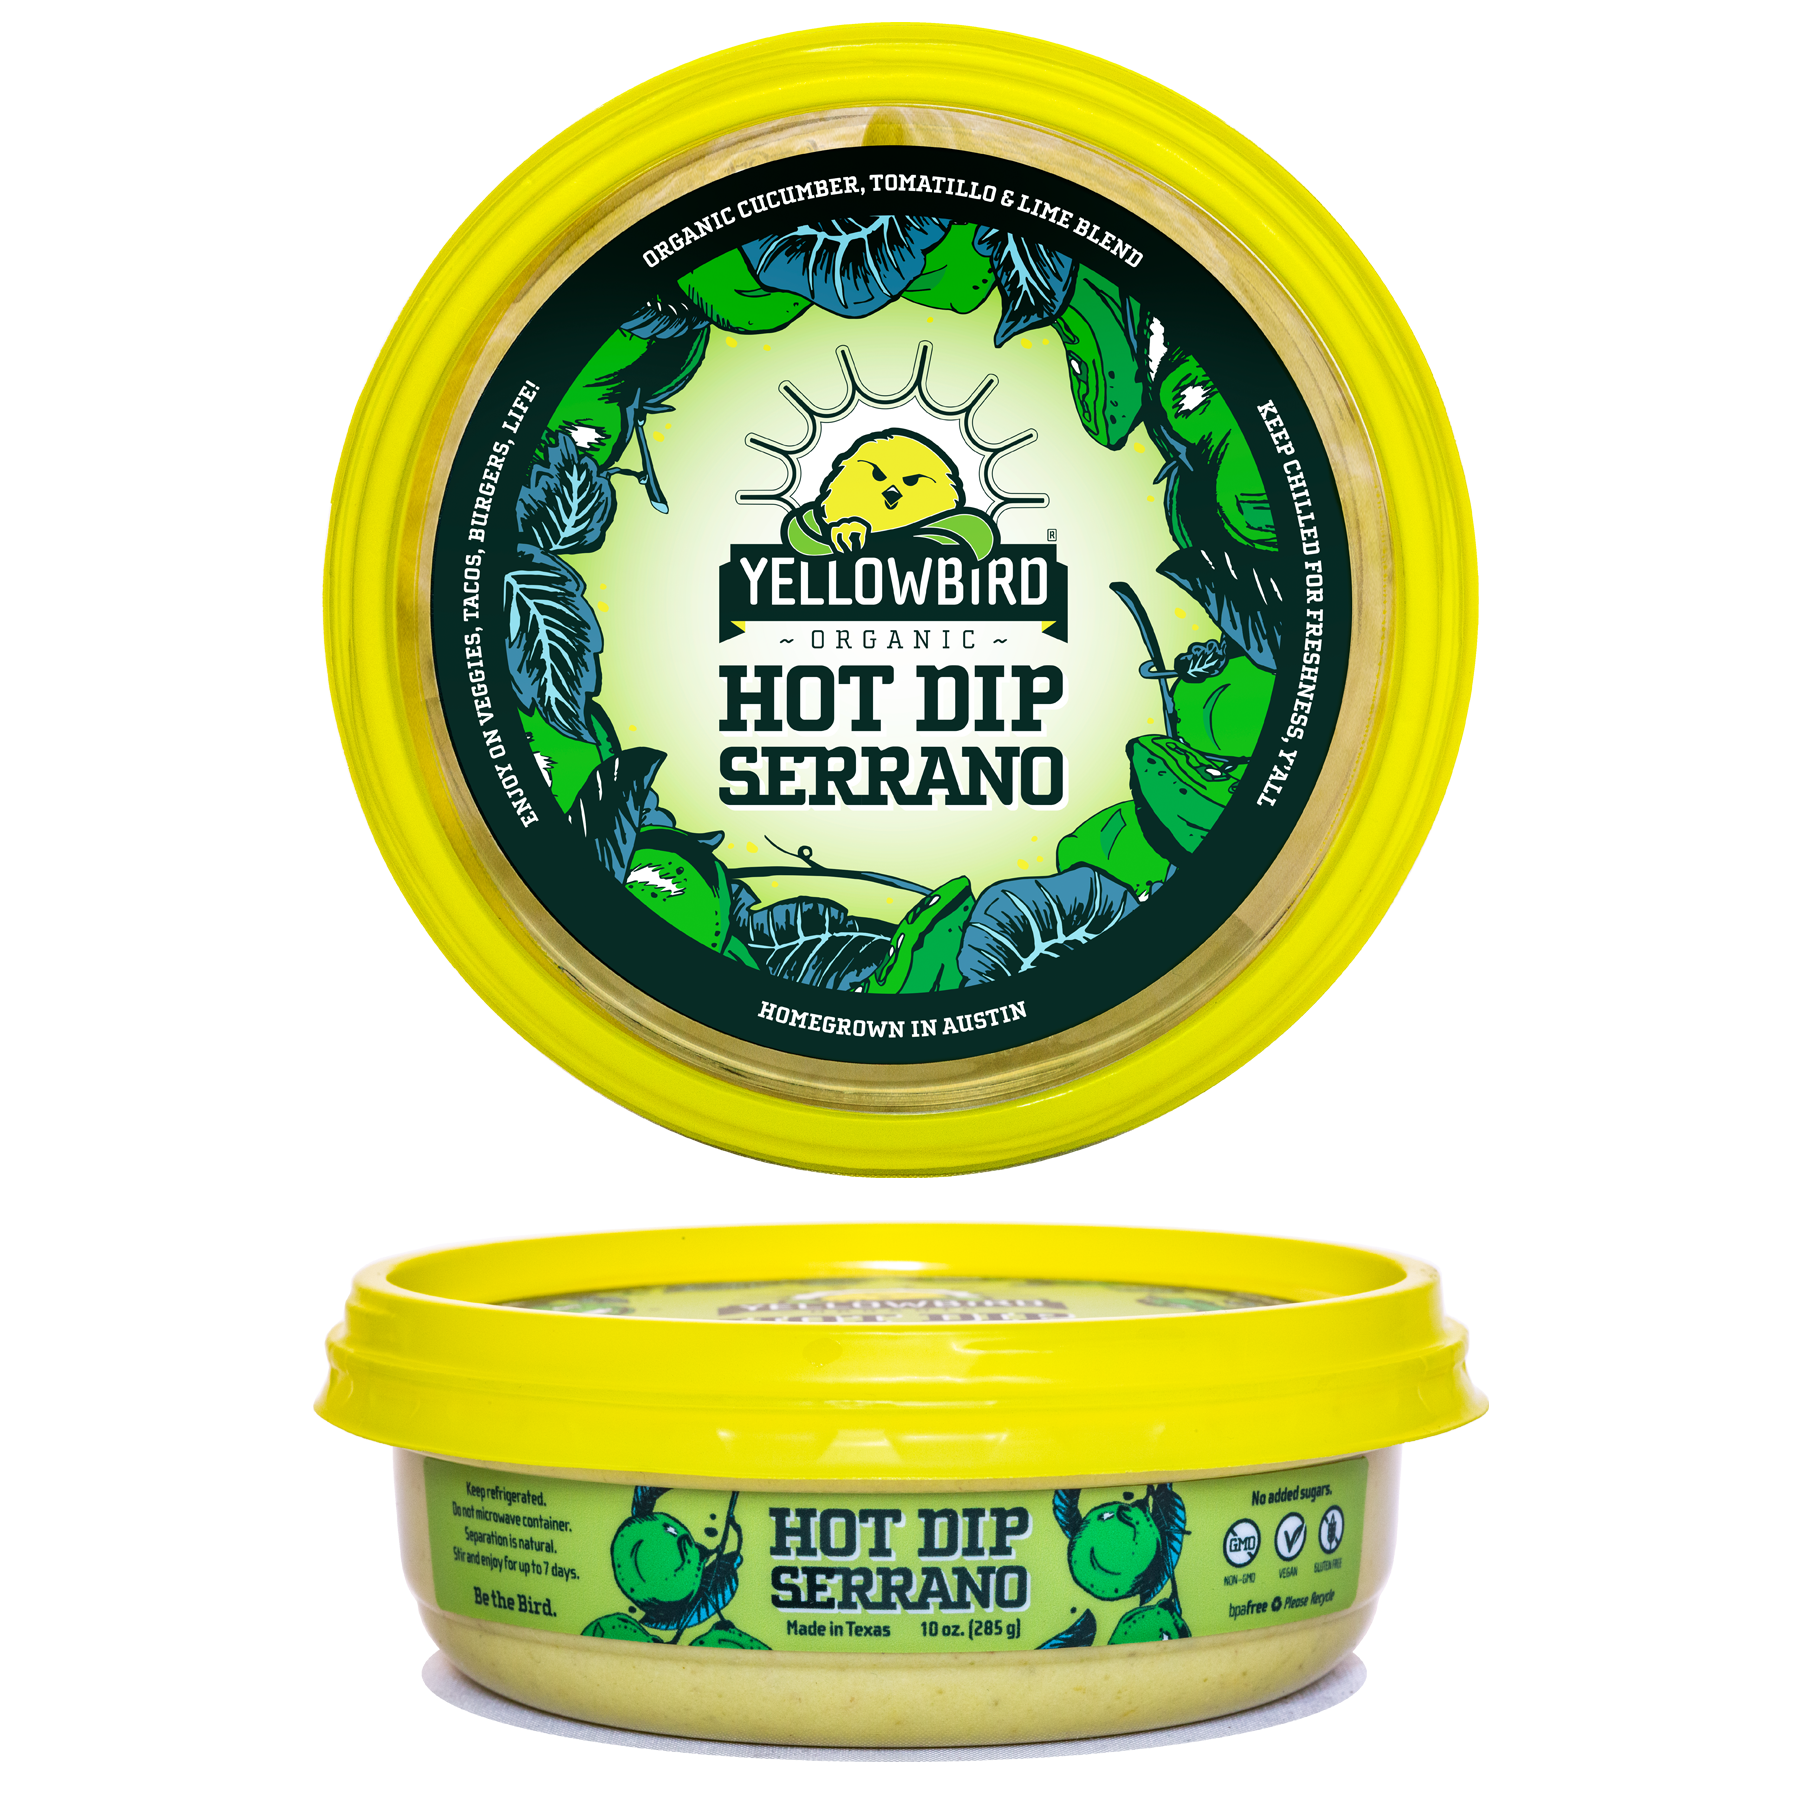 Hot Dip Serrano - Yellowbird Foods - Certified Paleo, Keto Certified by the Paleo Foundation